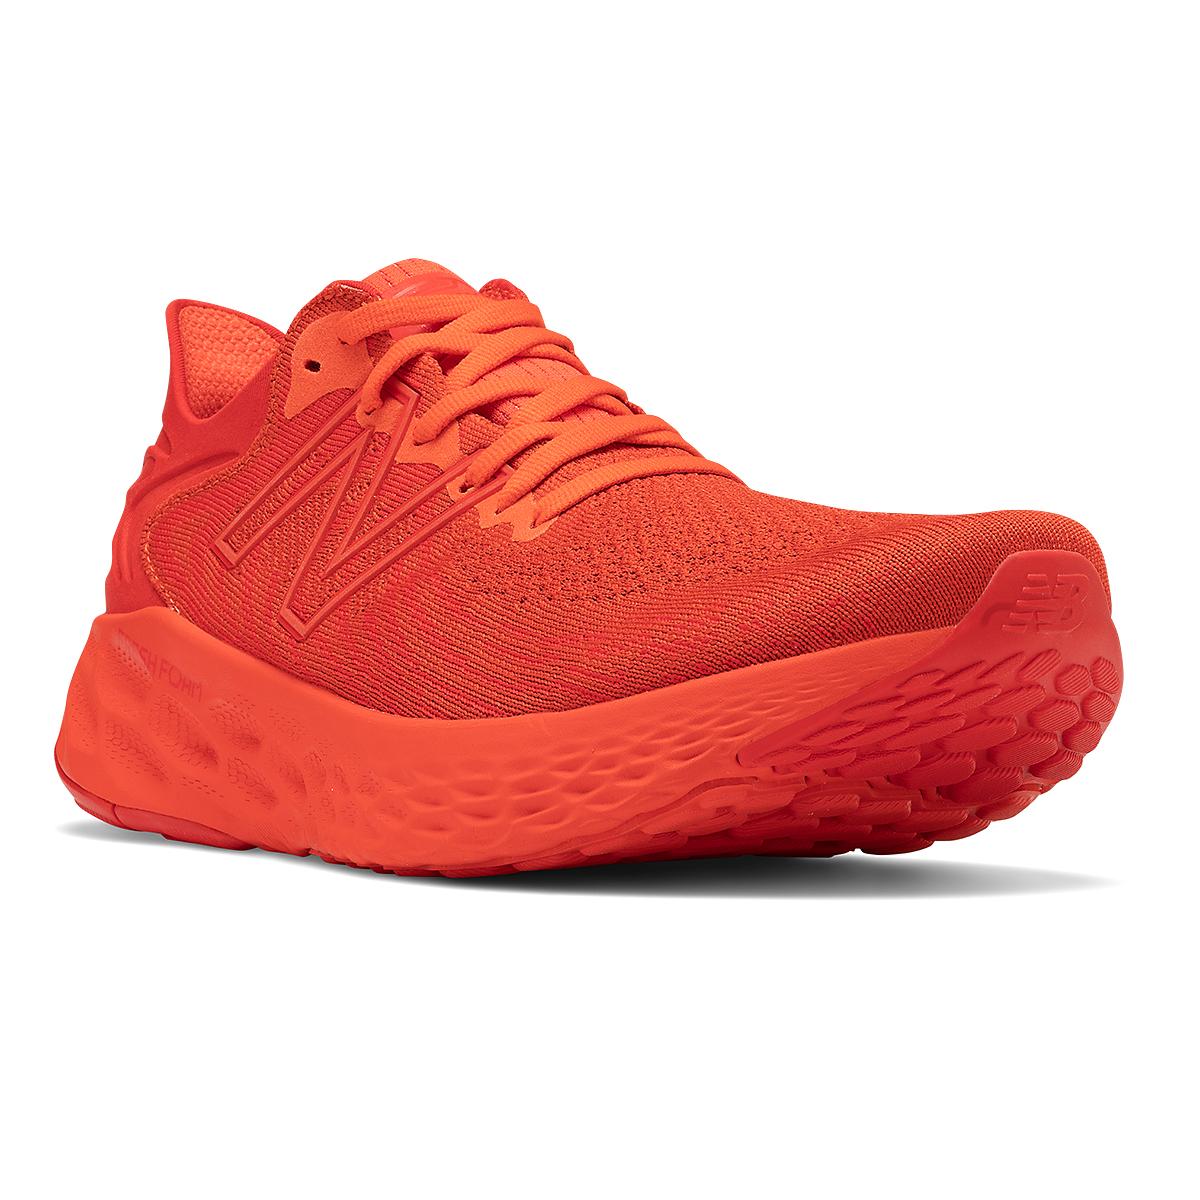 Men's New Balance Fresh Foam 1080V11 Running Shoe - Color: Ghost Pepper/Velocity Red - Size: 6 - Width: Wide, Ghost Pepper/Velocity Red, large, image 3